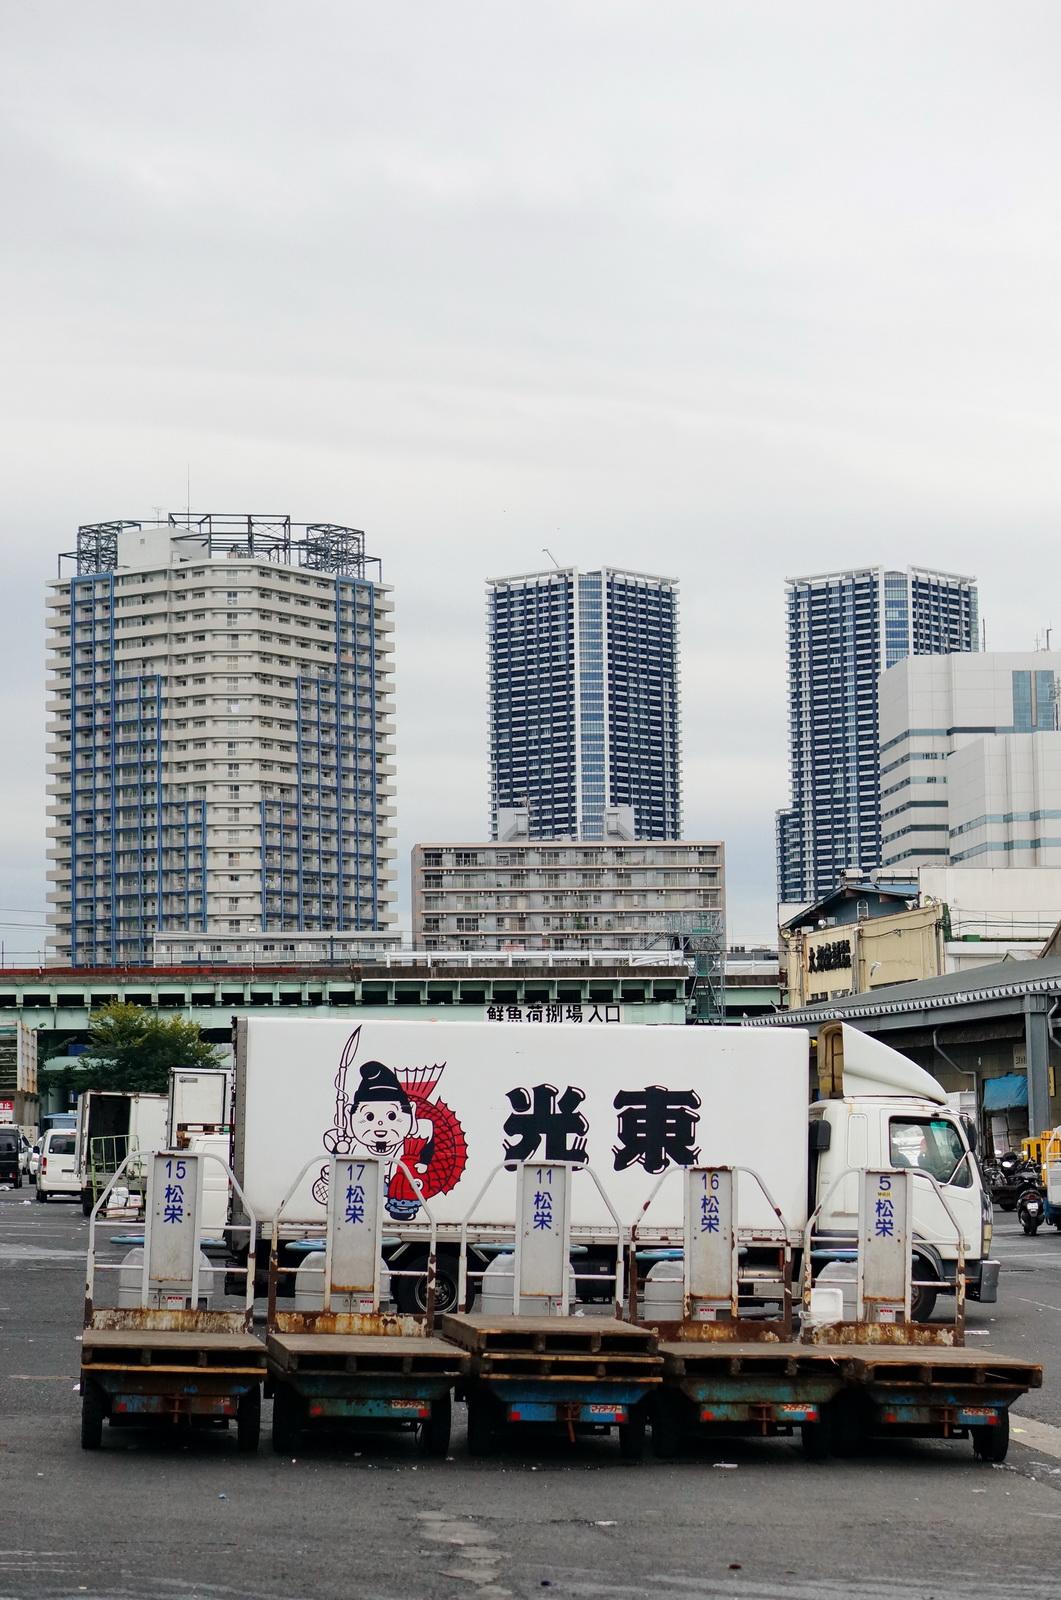 tsukiji market, marché poissons tsukiji, tokyo, tokyo city guide, voyage au japon, japan trip, séjour tokyo, incontournable tokyo, citylife tokyo